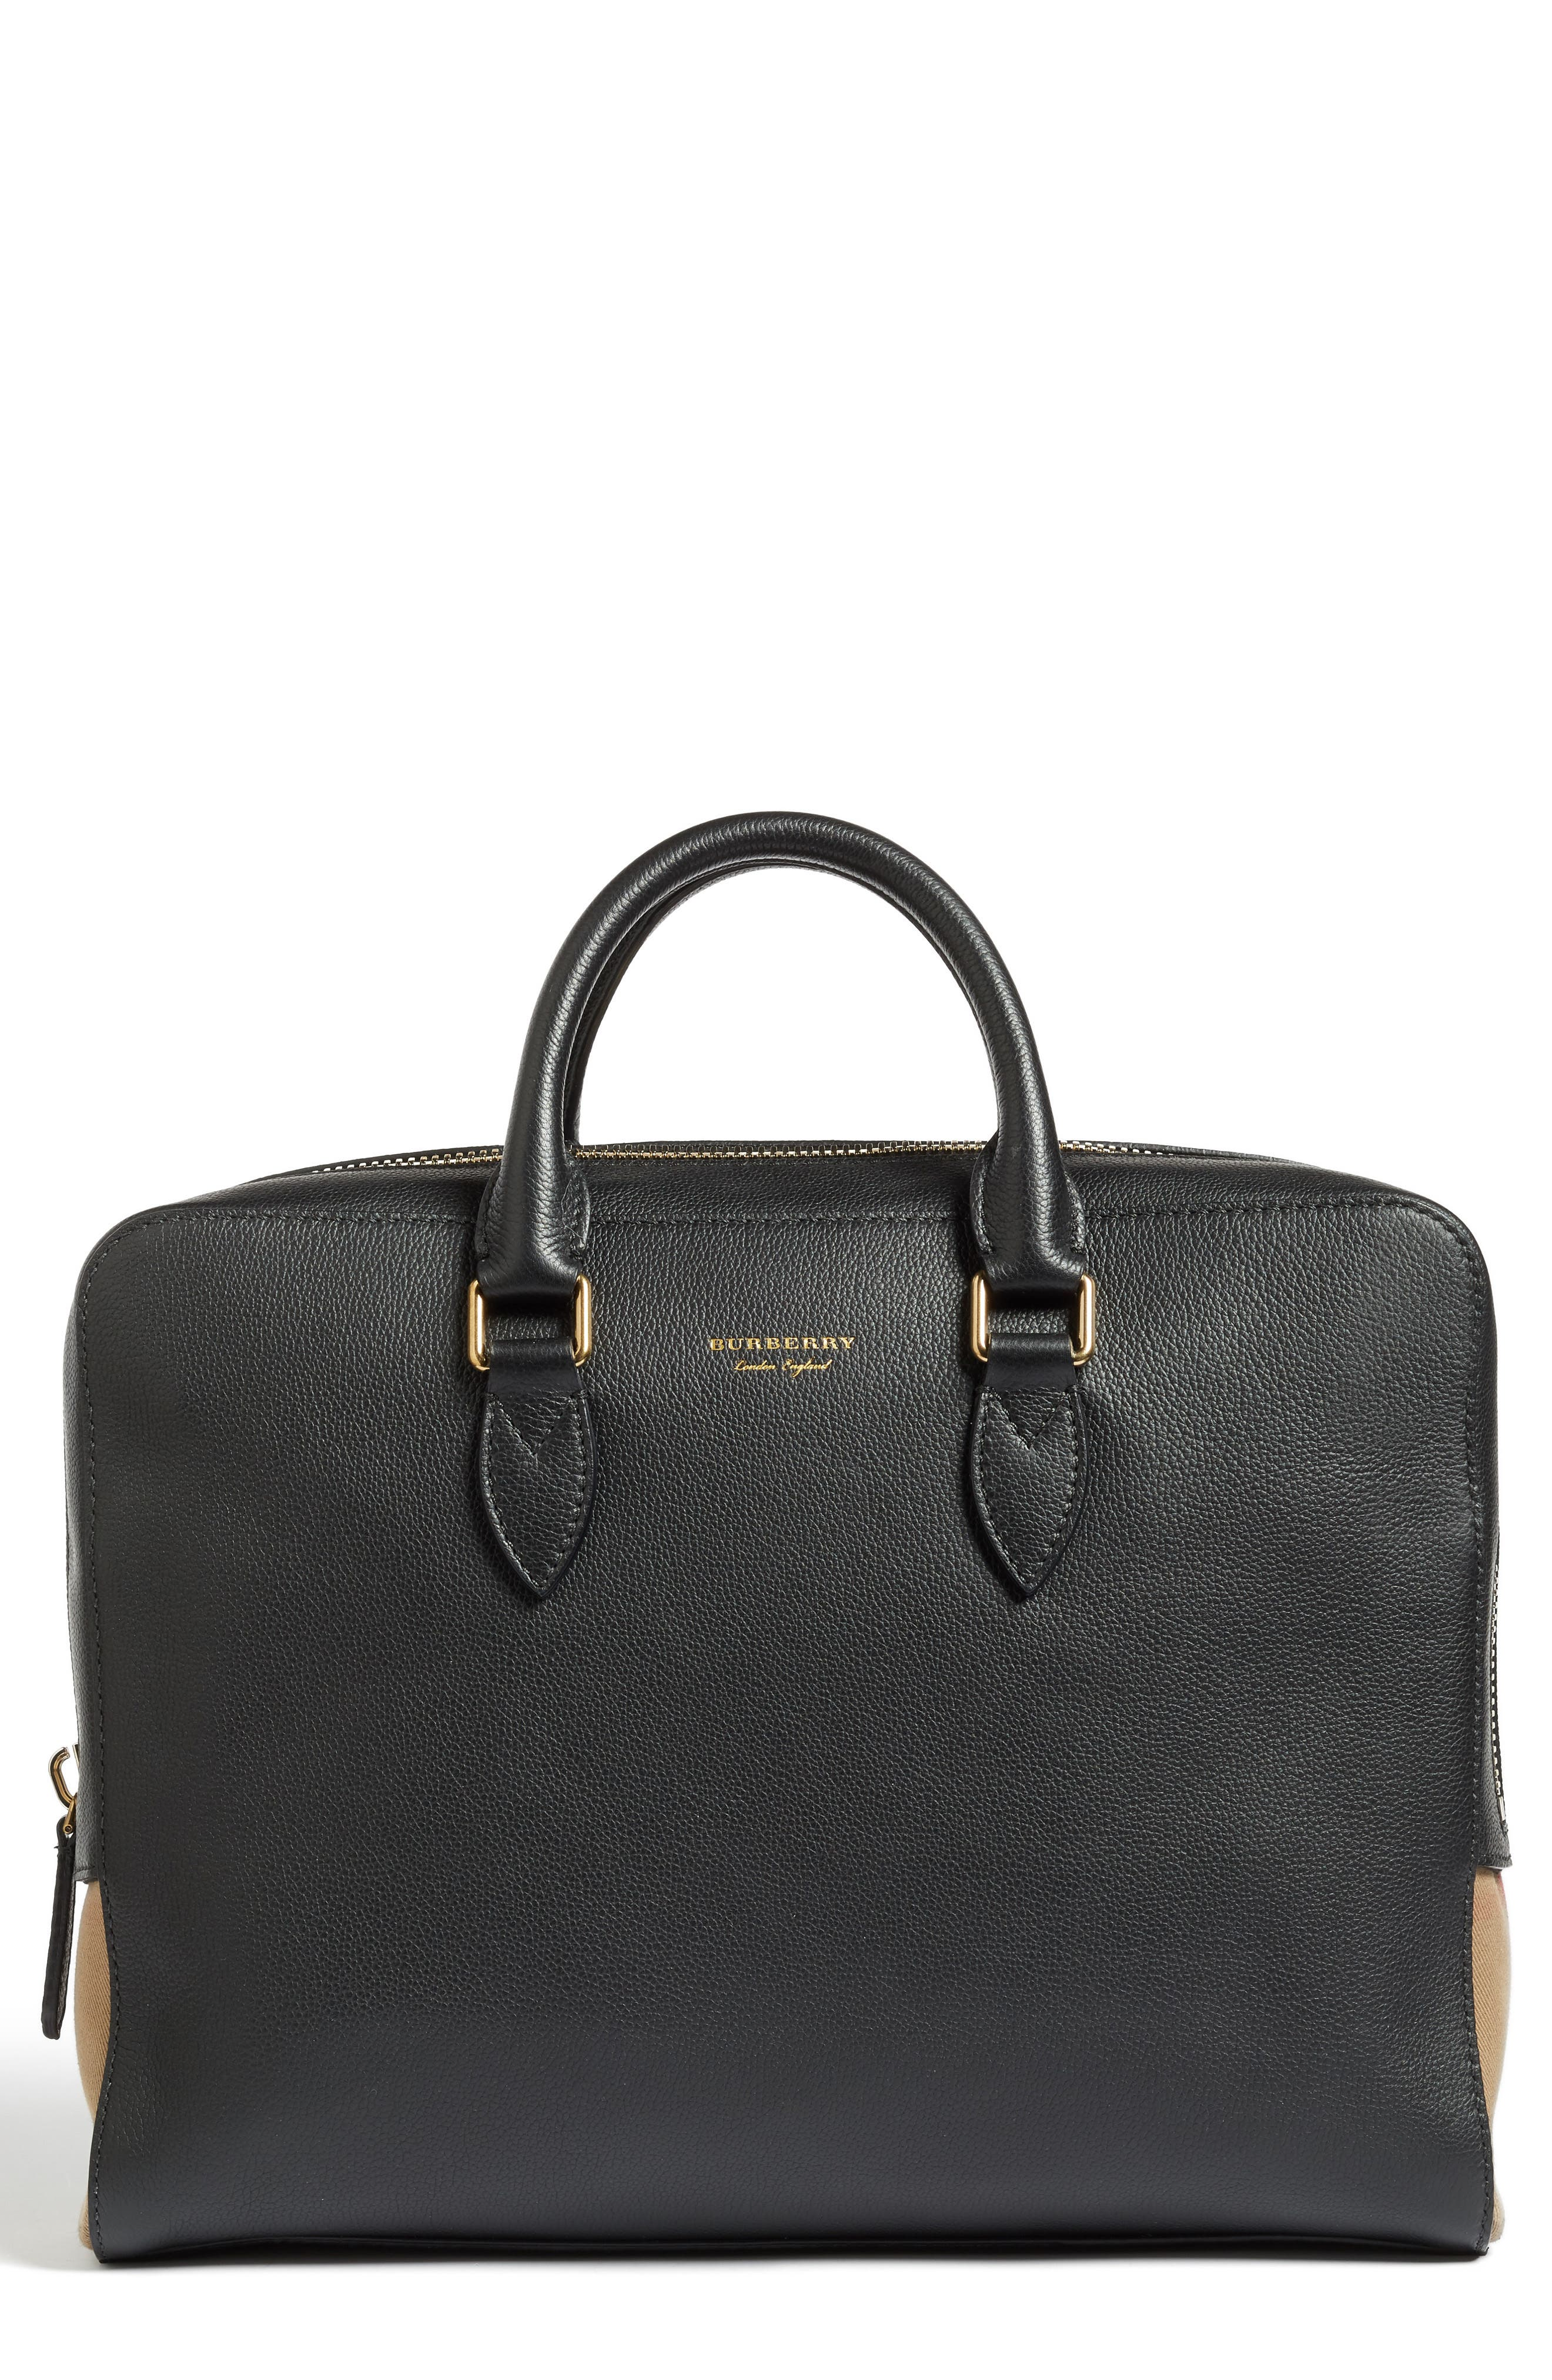 Horton Leather Briefcase,                             Main thumbnail 1, color,                             001